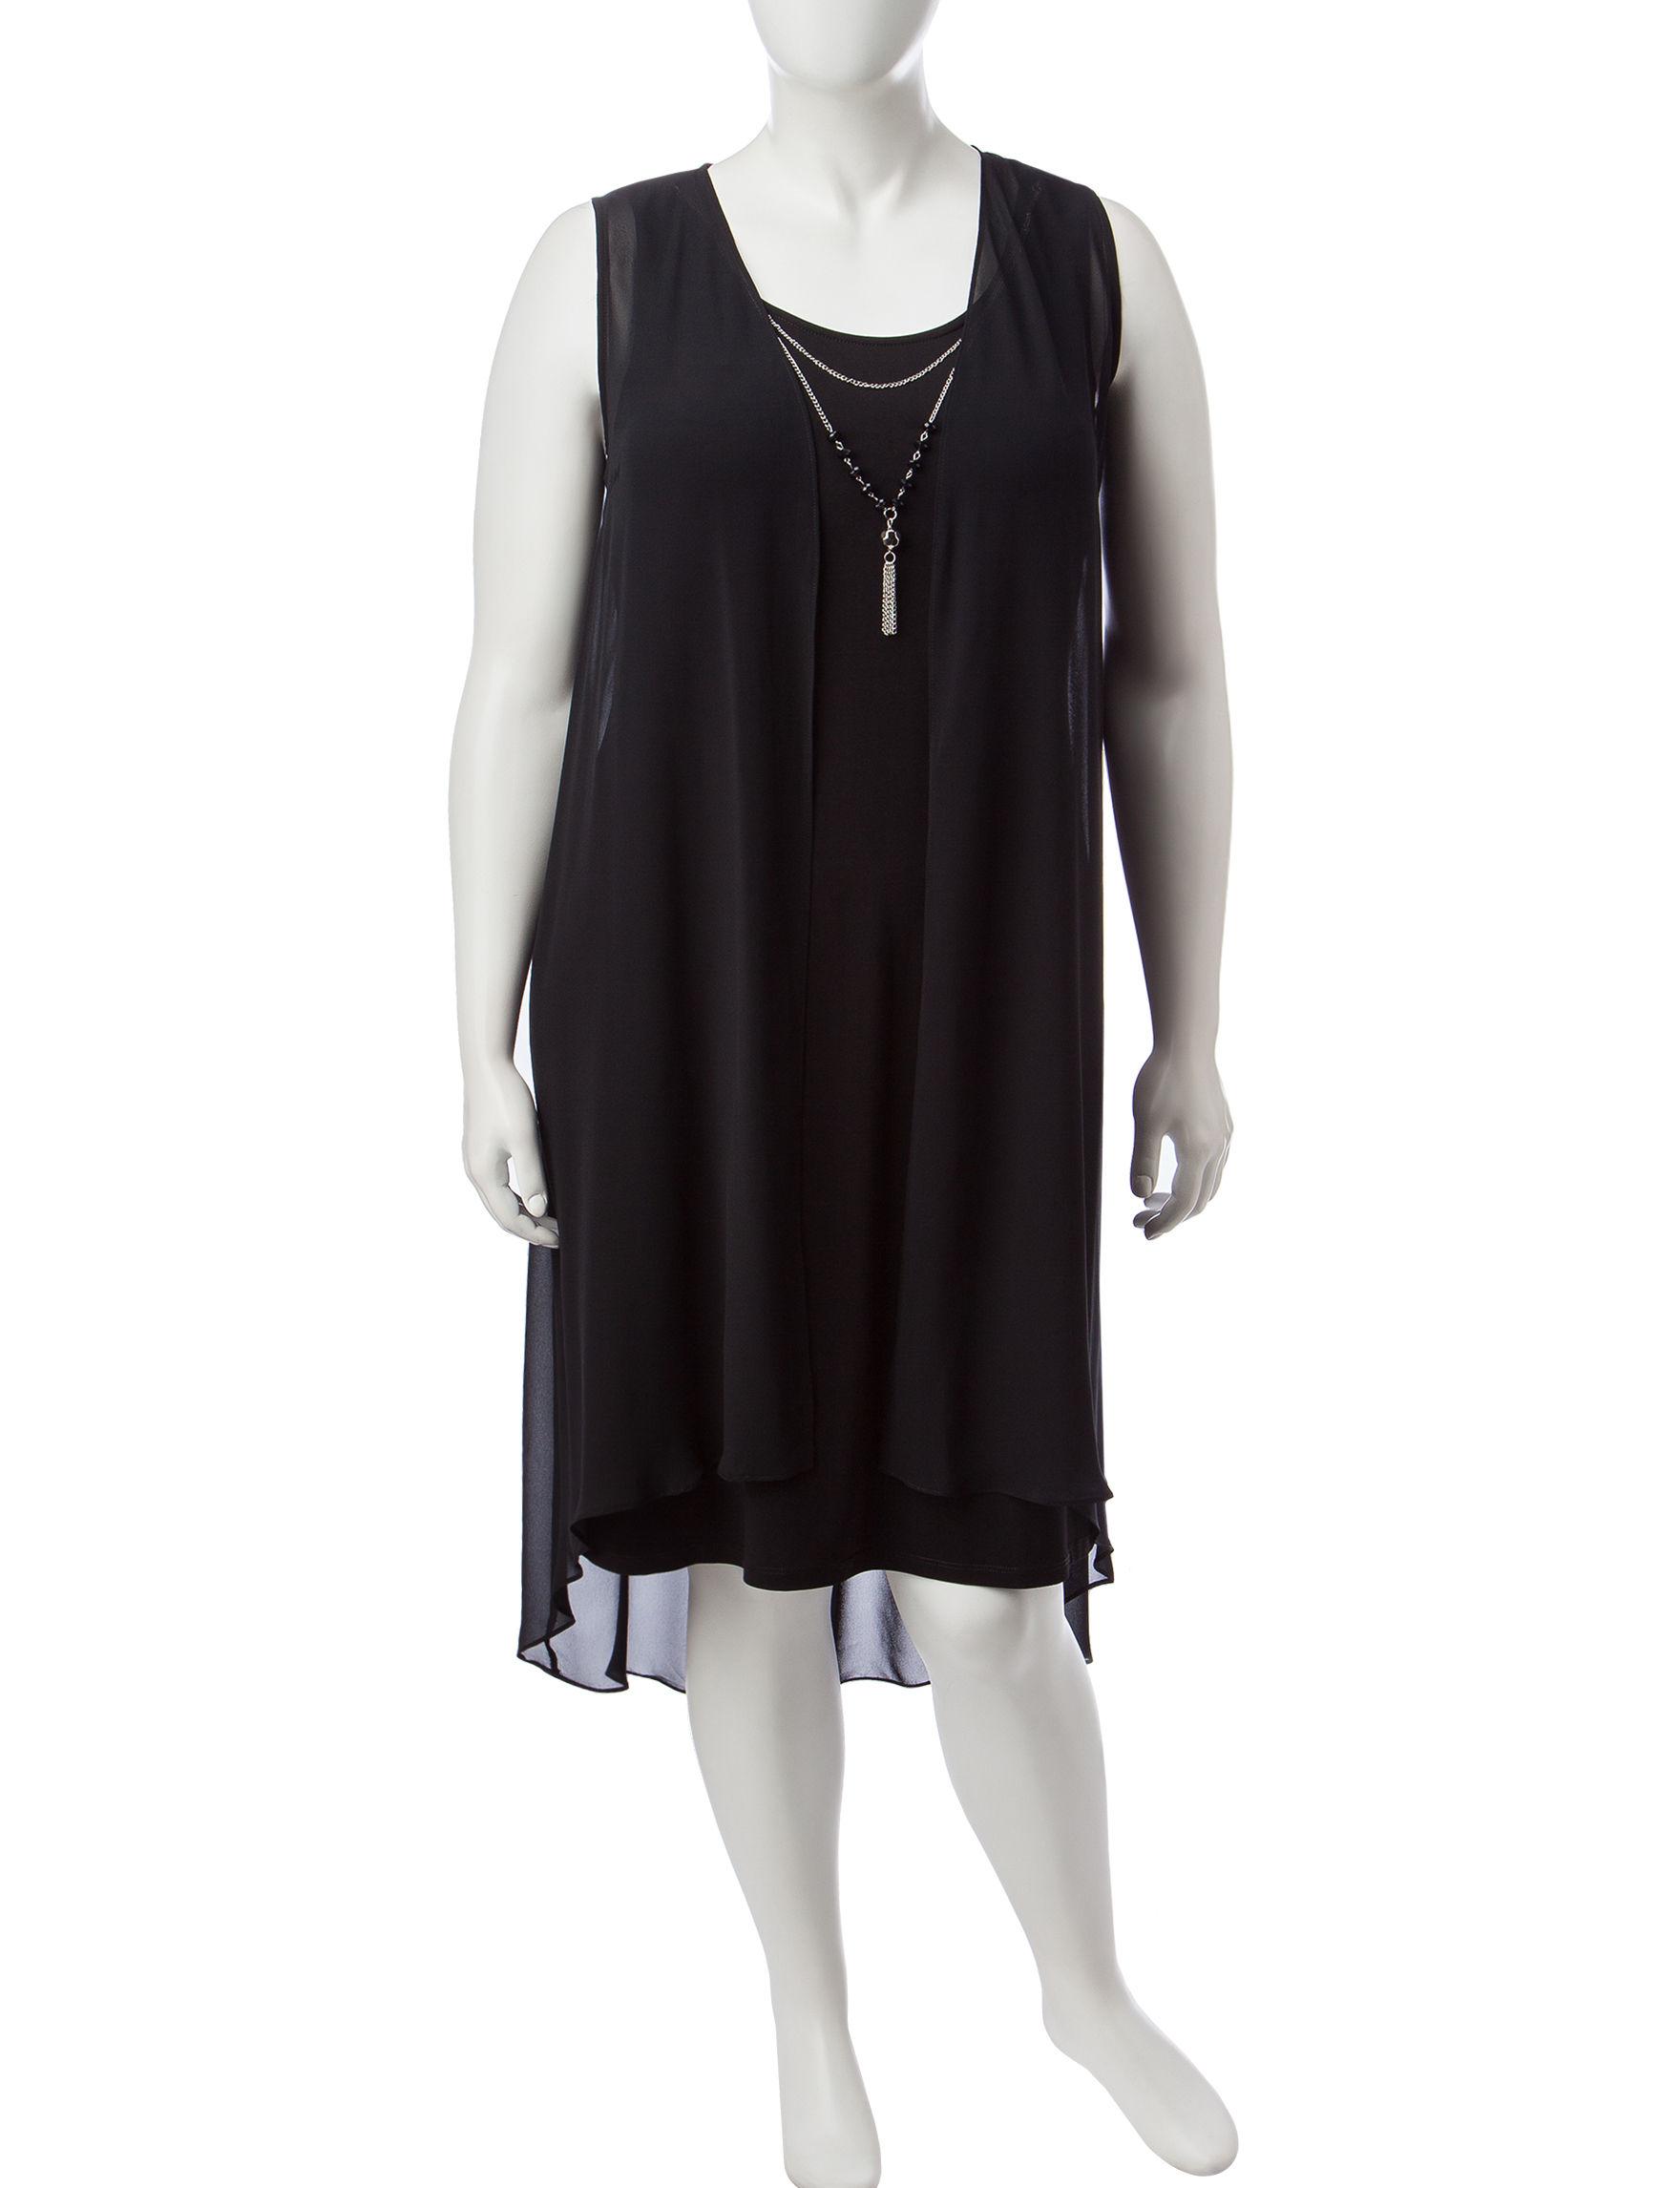 JM Studio Black Everyday & Casual Jacket Dresses